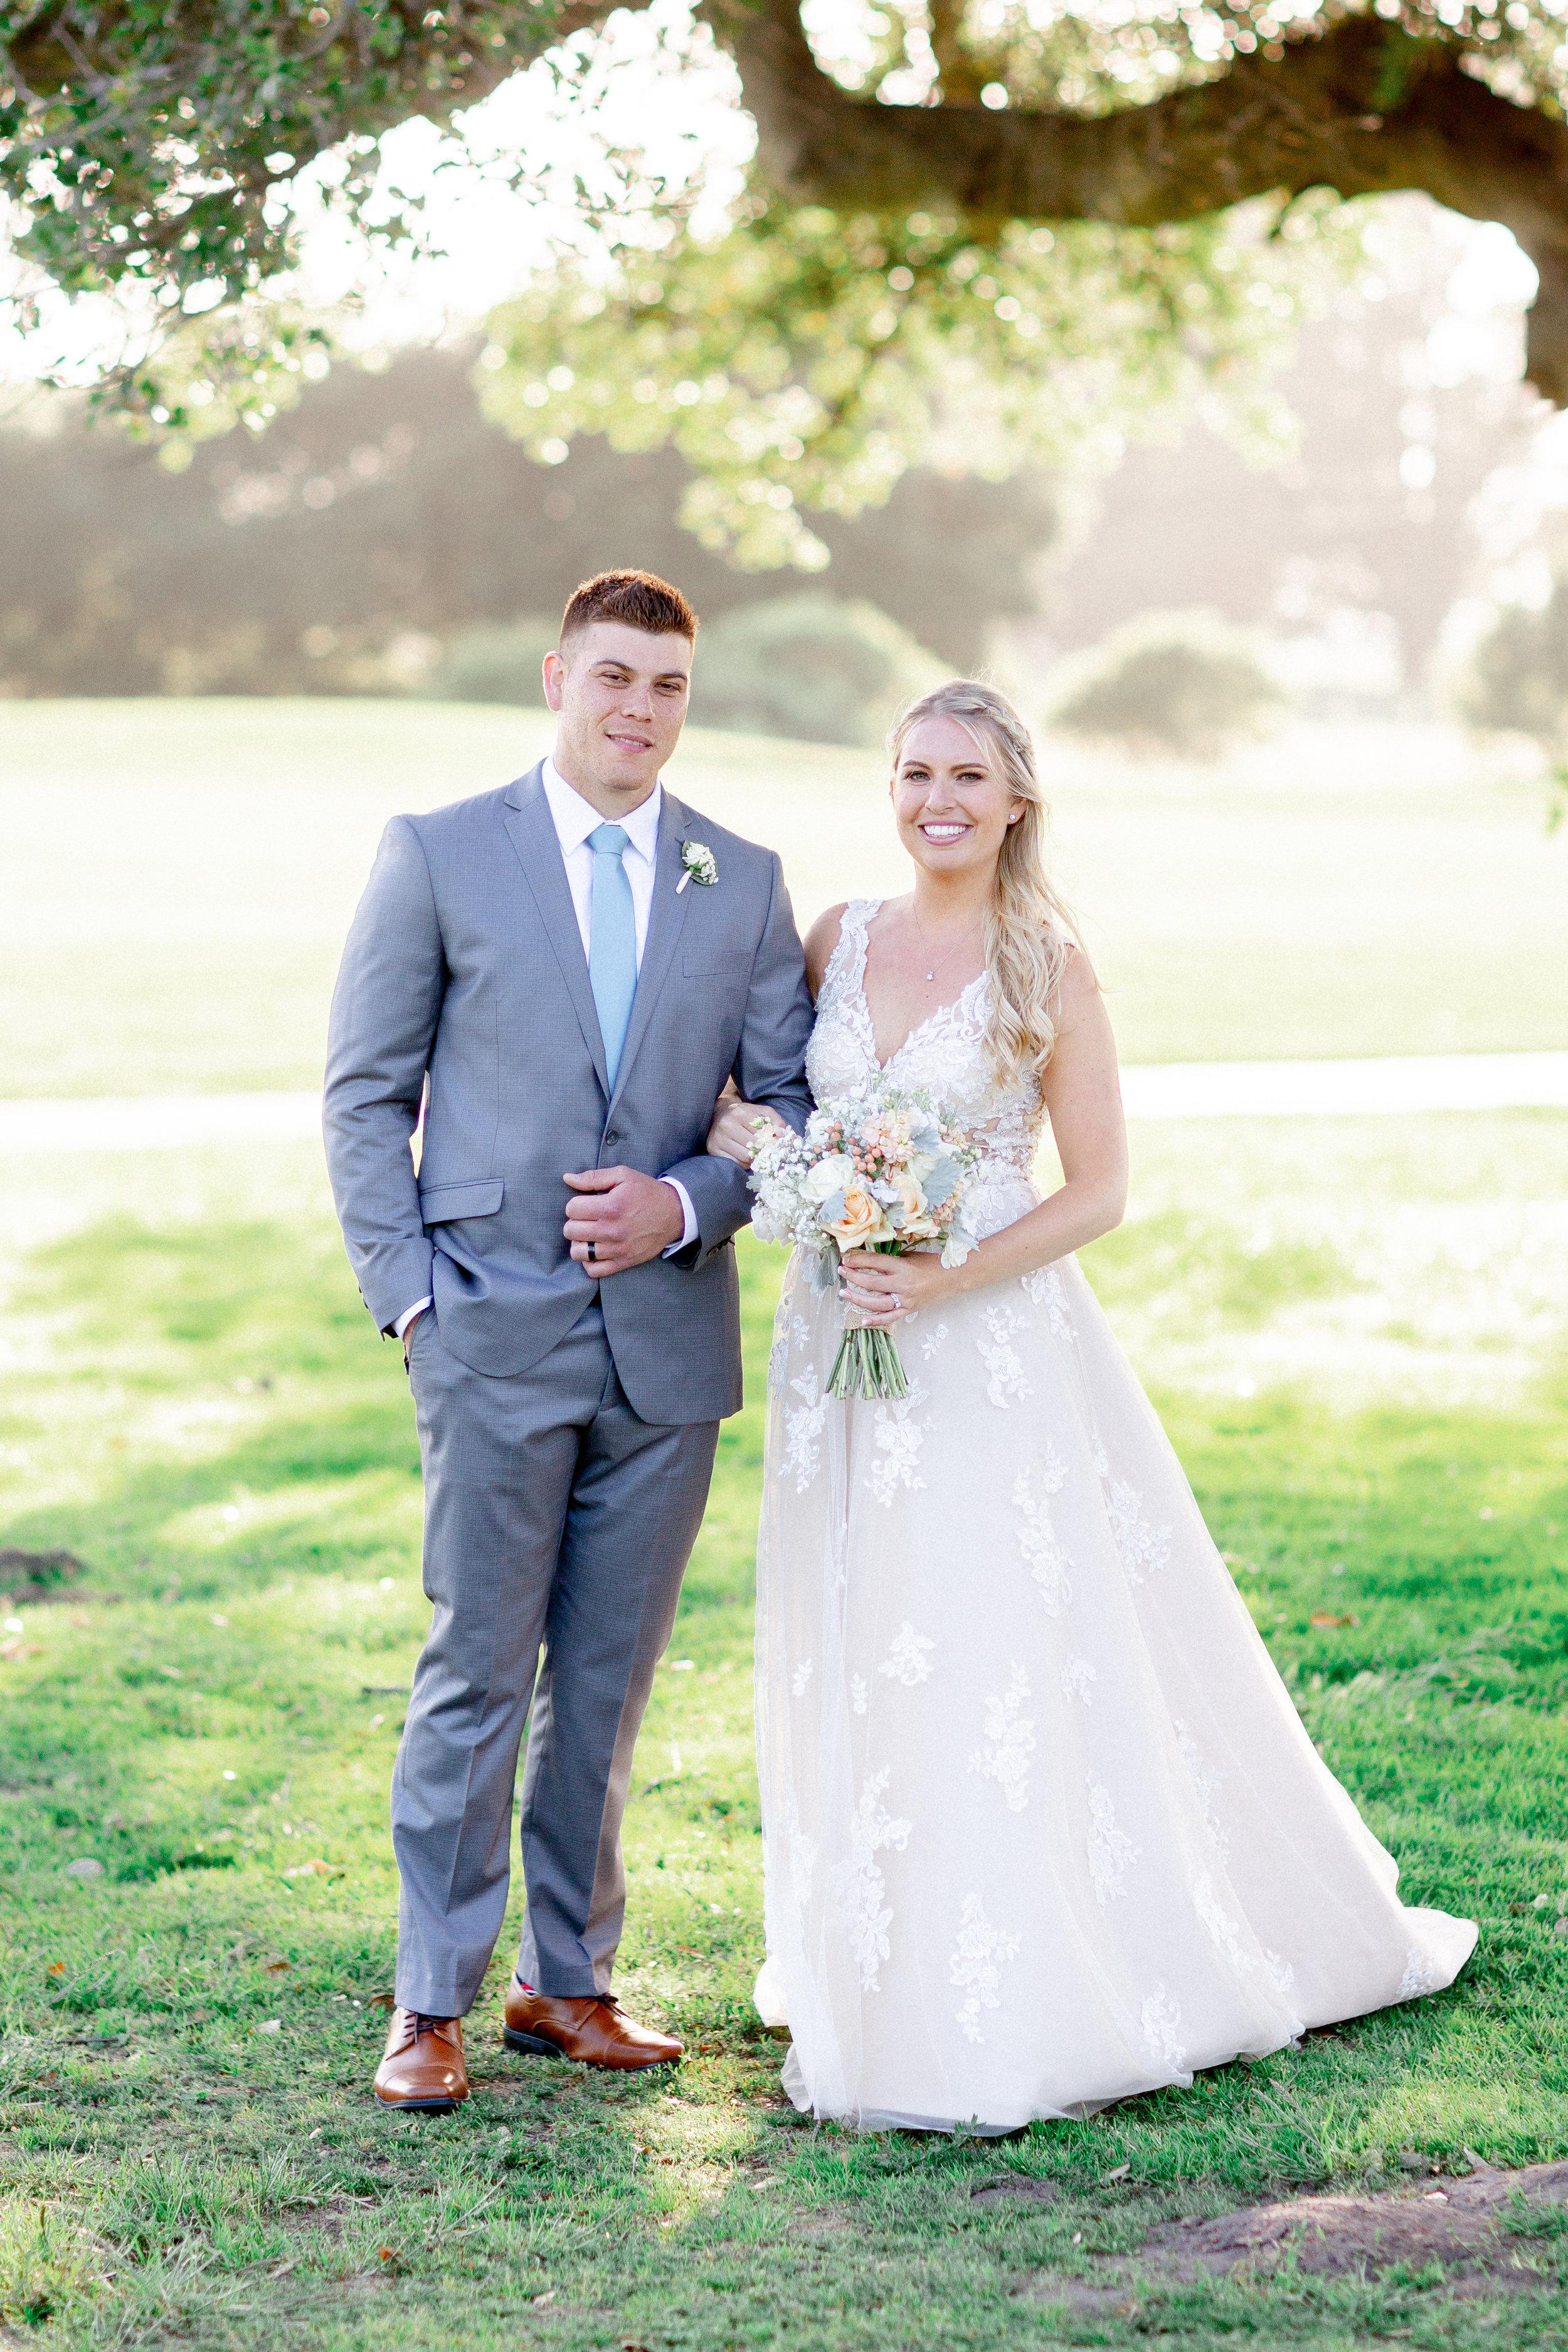 Eagle-Vines-Golf-Course-wedding-photographer (165 of 206).jpg